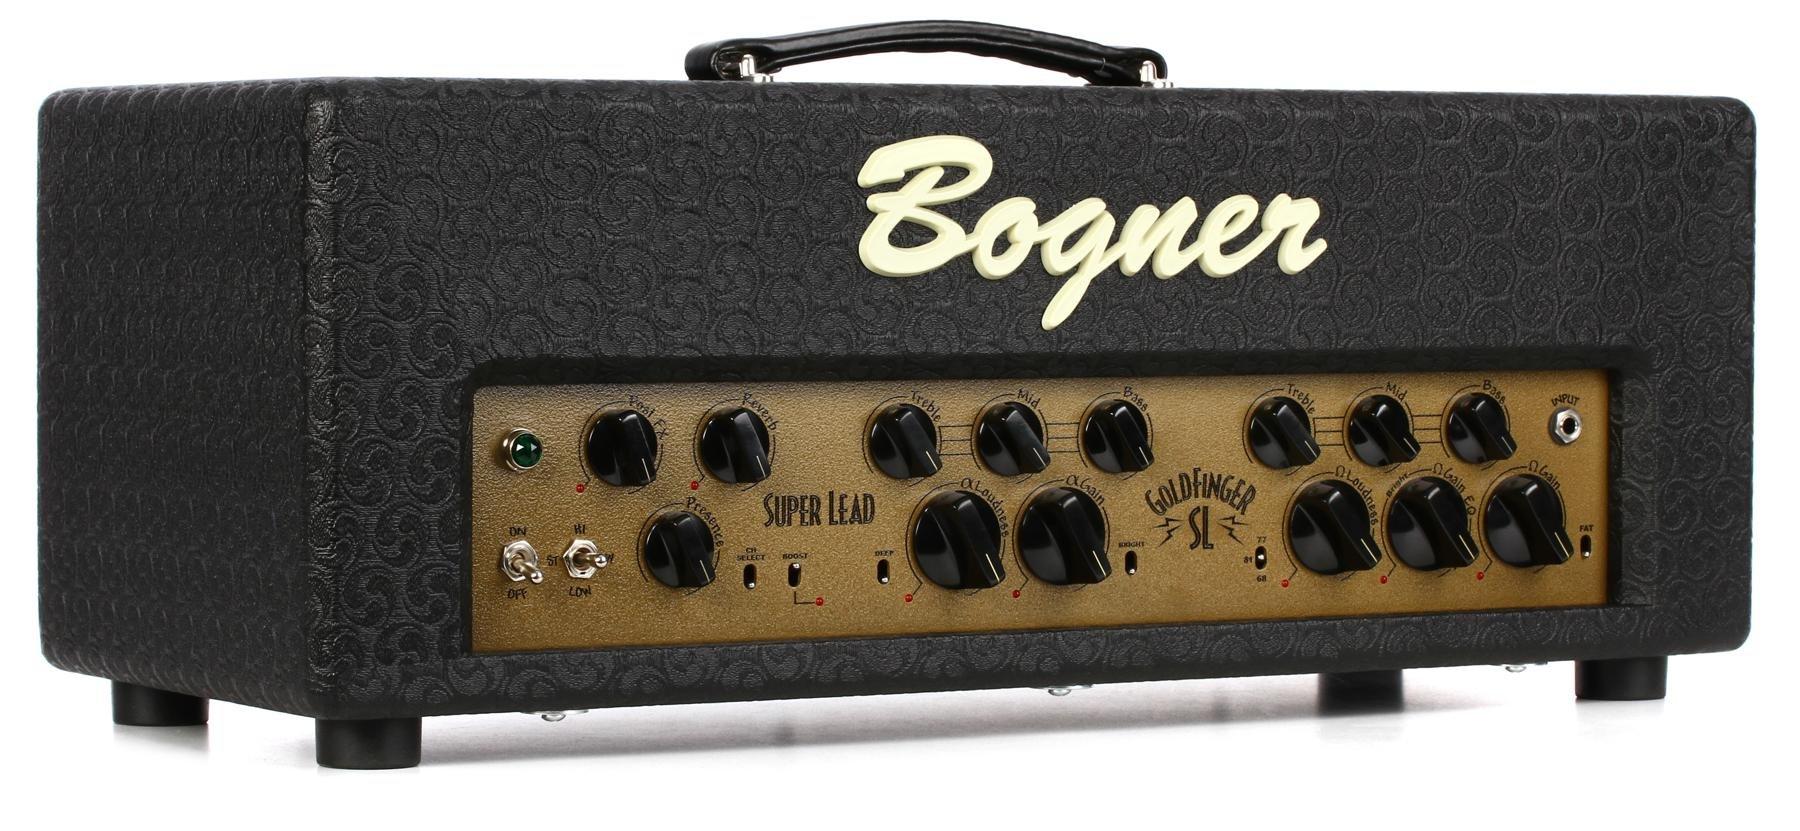 Bogner Gf45 Sl Goldfinger Superlead 45 Watt Handwired Tube Head 45w Power Amplifier Include Tone Control Image 1